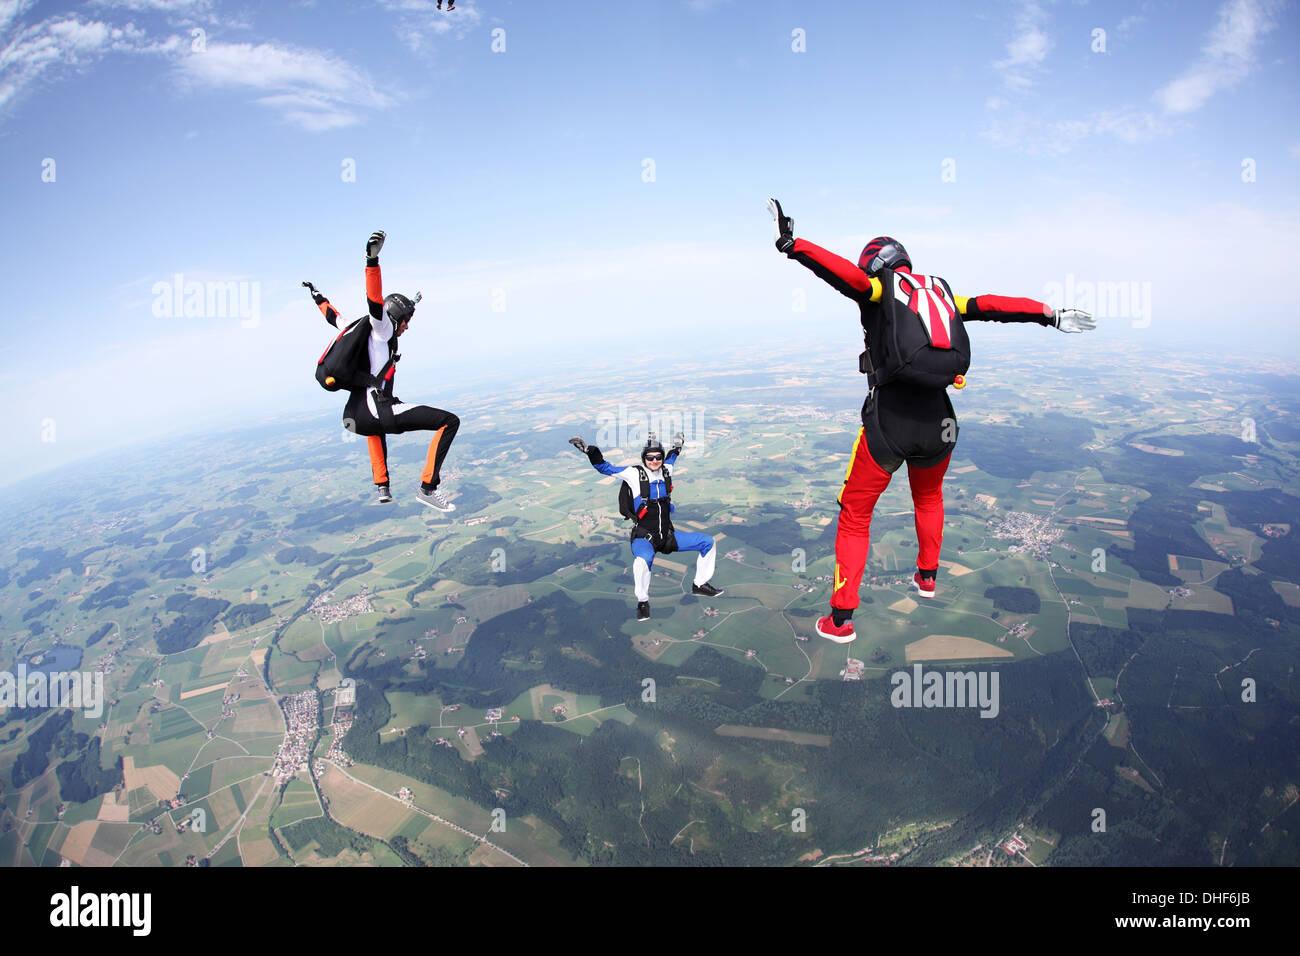 Drei Fallschirmspringer frei fallen über Leutkirch, Bayern, Deutschland Stockbild